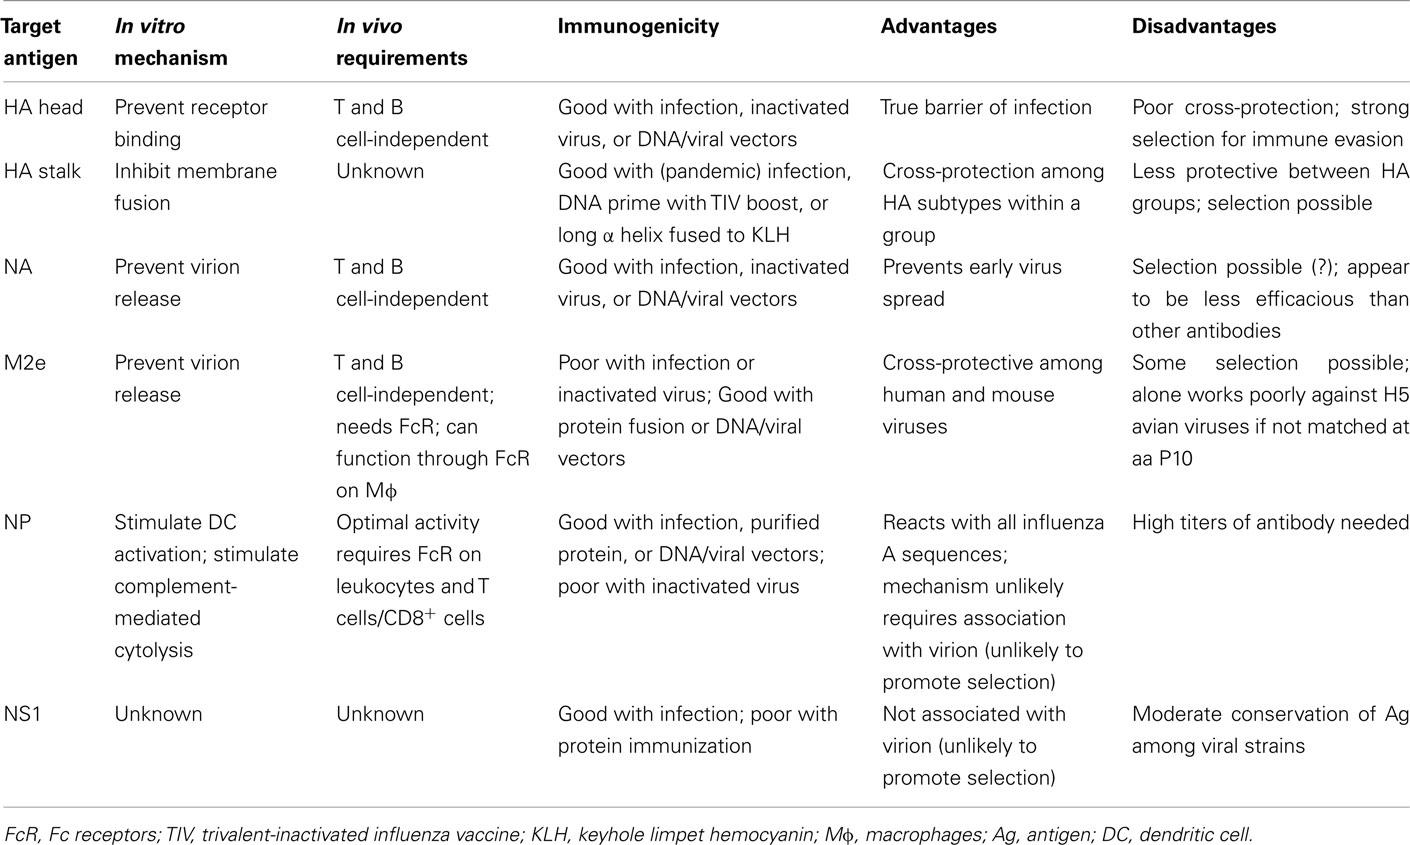 Influenza Virus Antibodies Against Influenza Virus